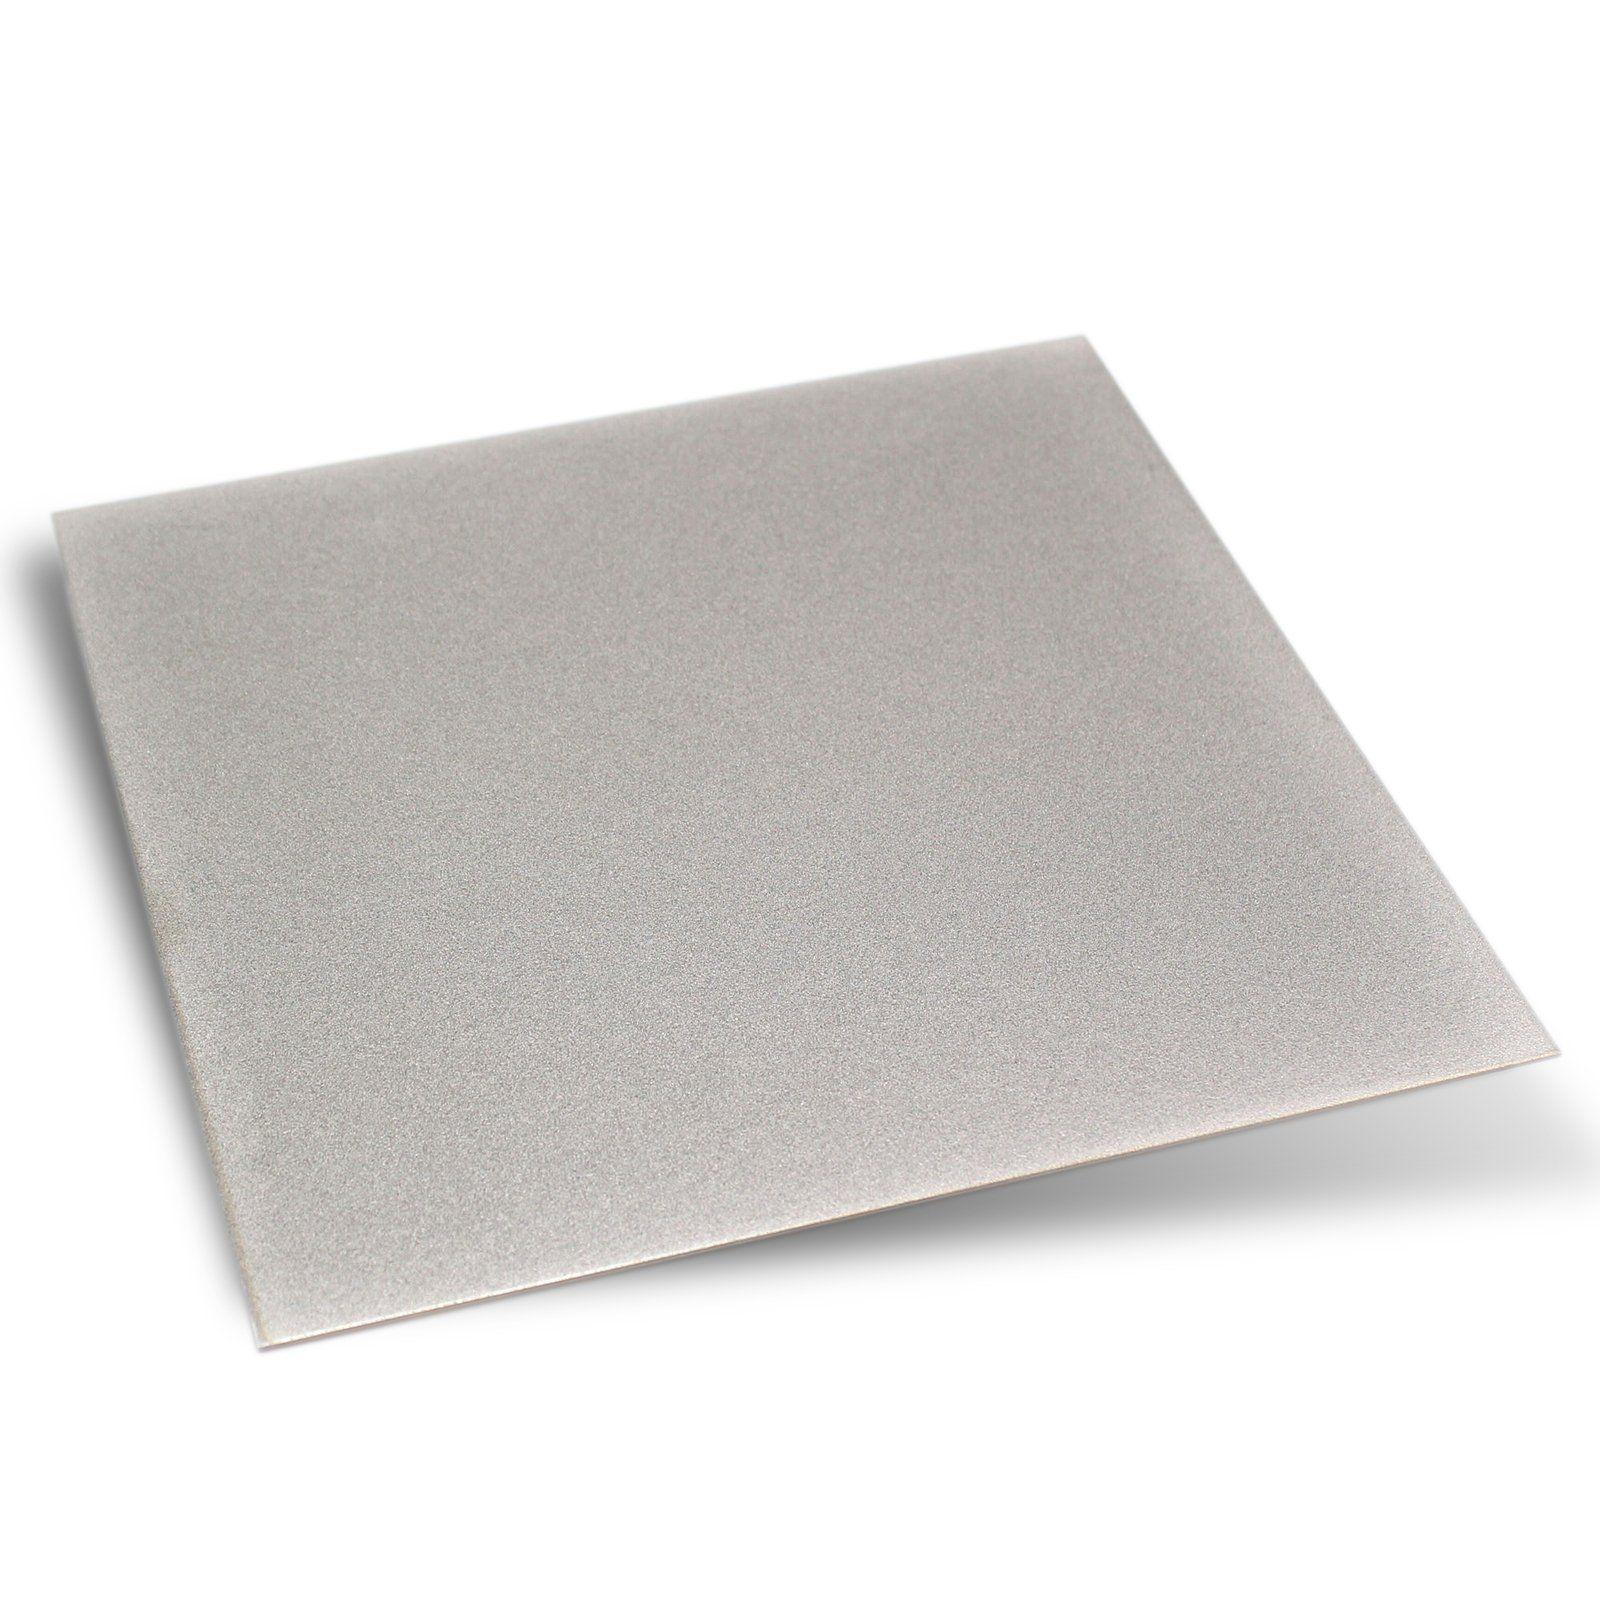 Jingling 6x6 Thin Square Sheet Flat Diamond Stone Sharpeners Grit 240 For Lapidary Knives Color Silver For More Details Ch Sharpeners Diamond Stone Lapidary